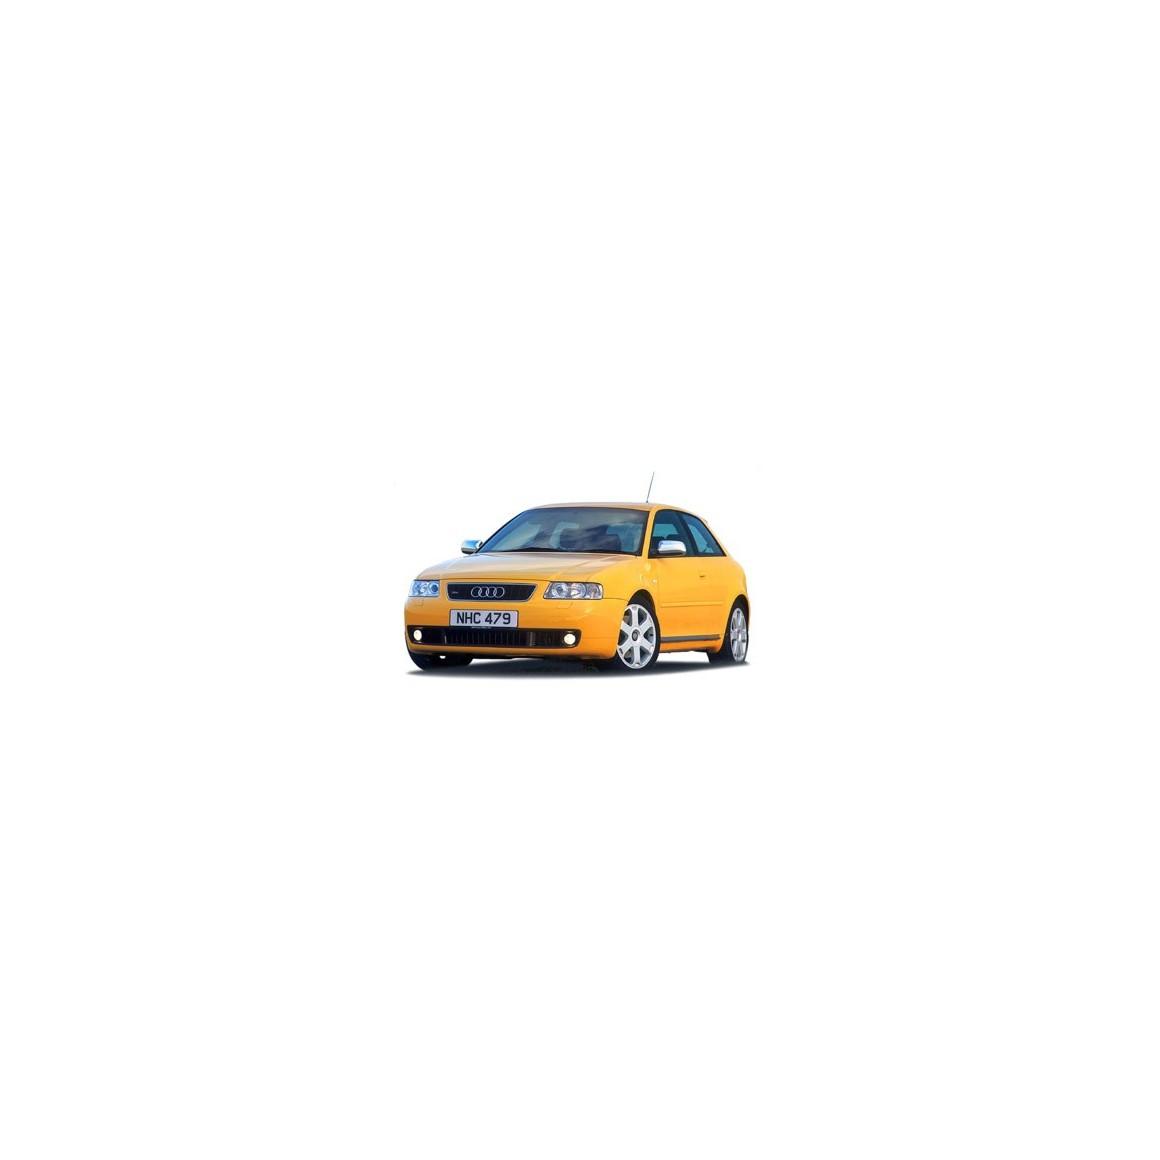 Editing Audi A3 - 2003